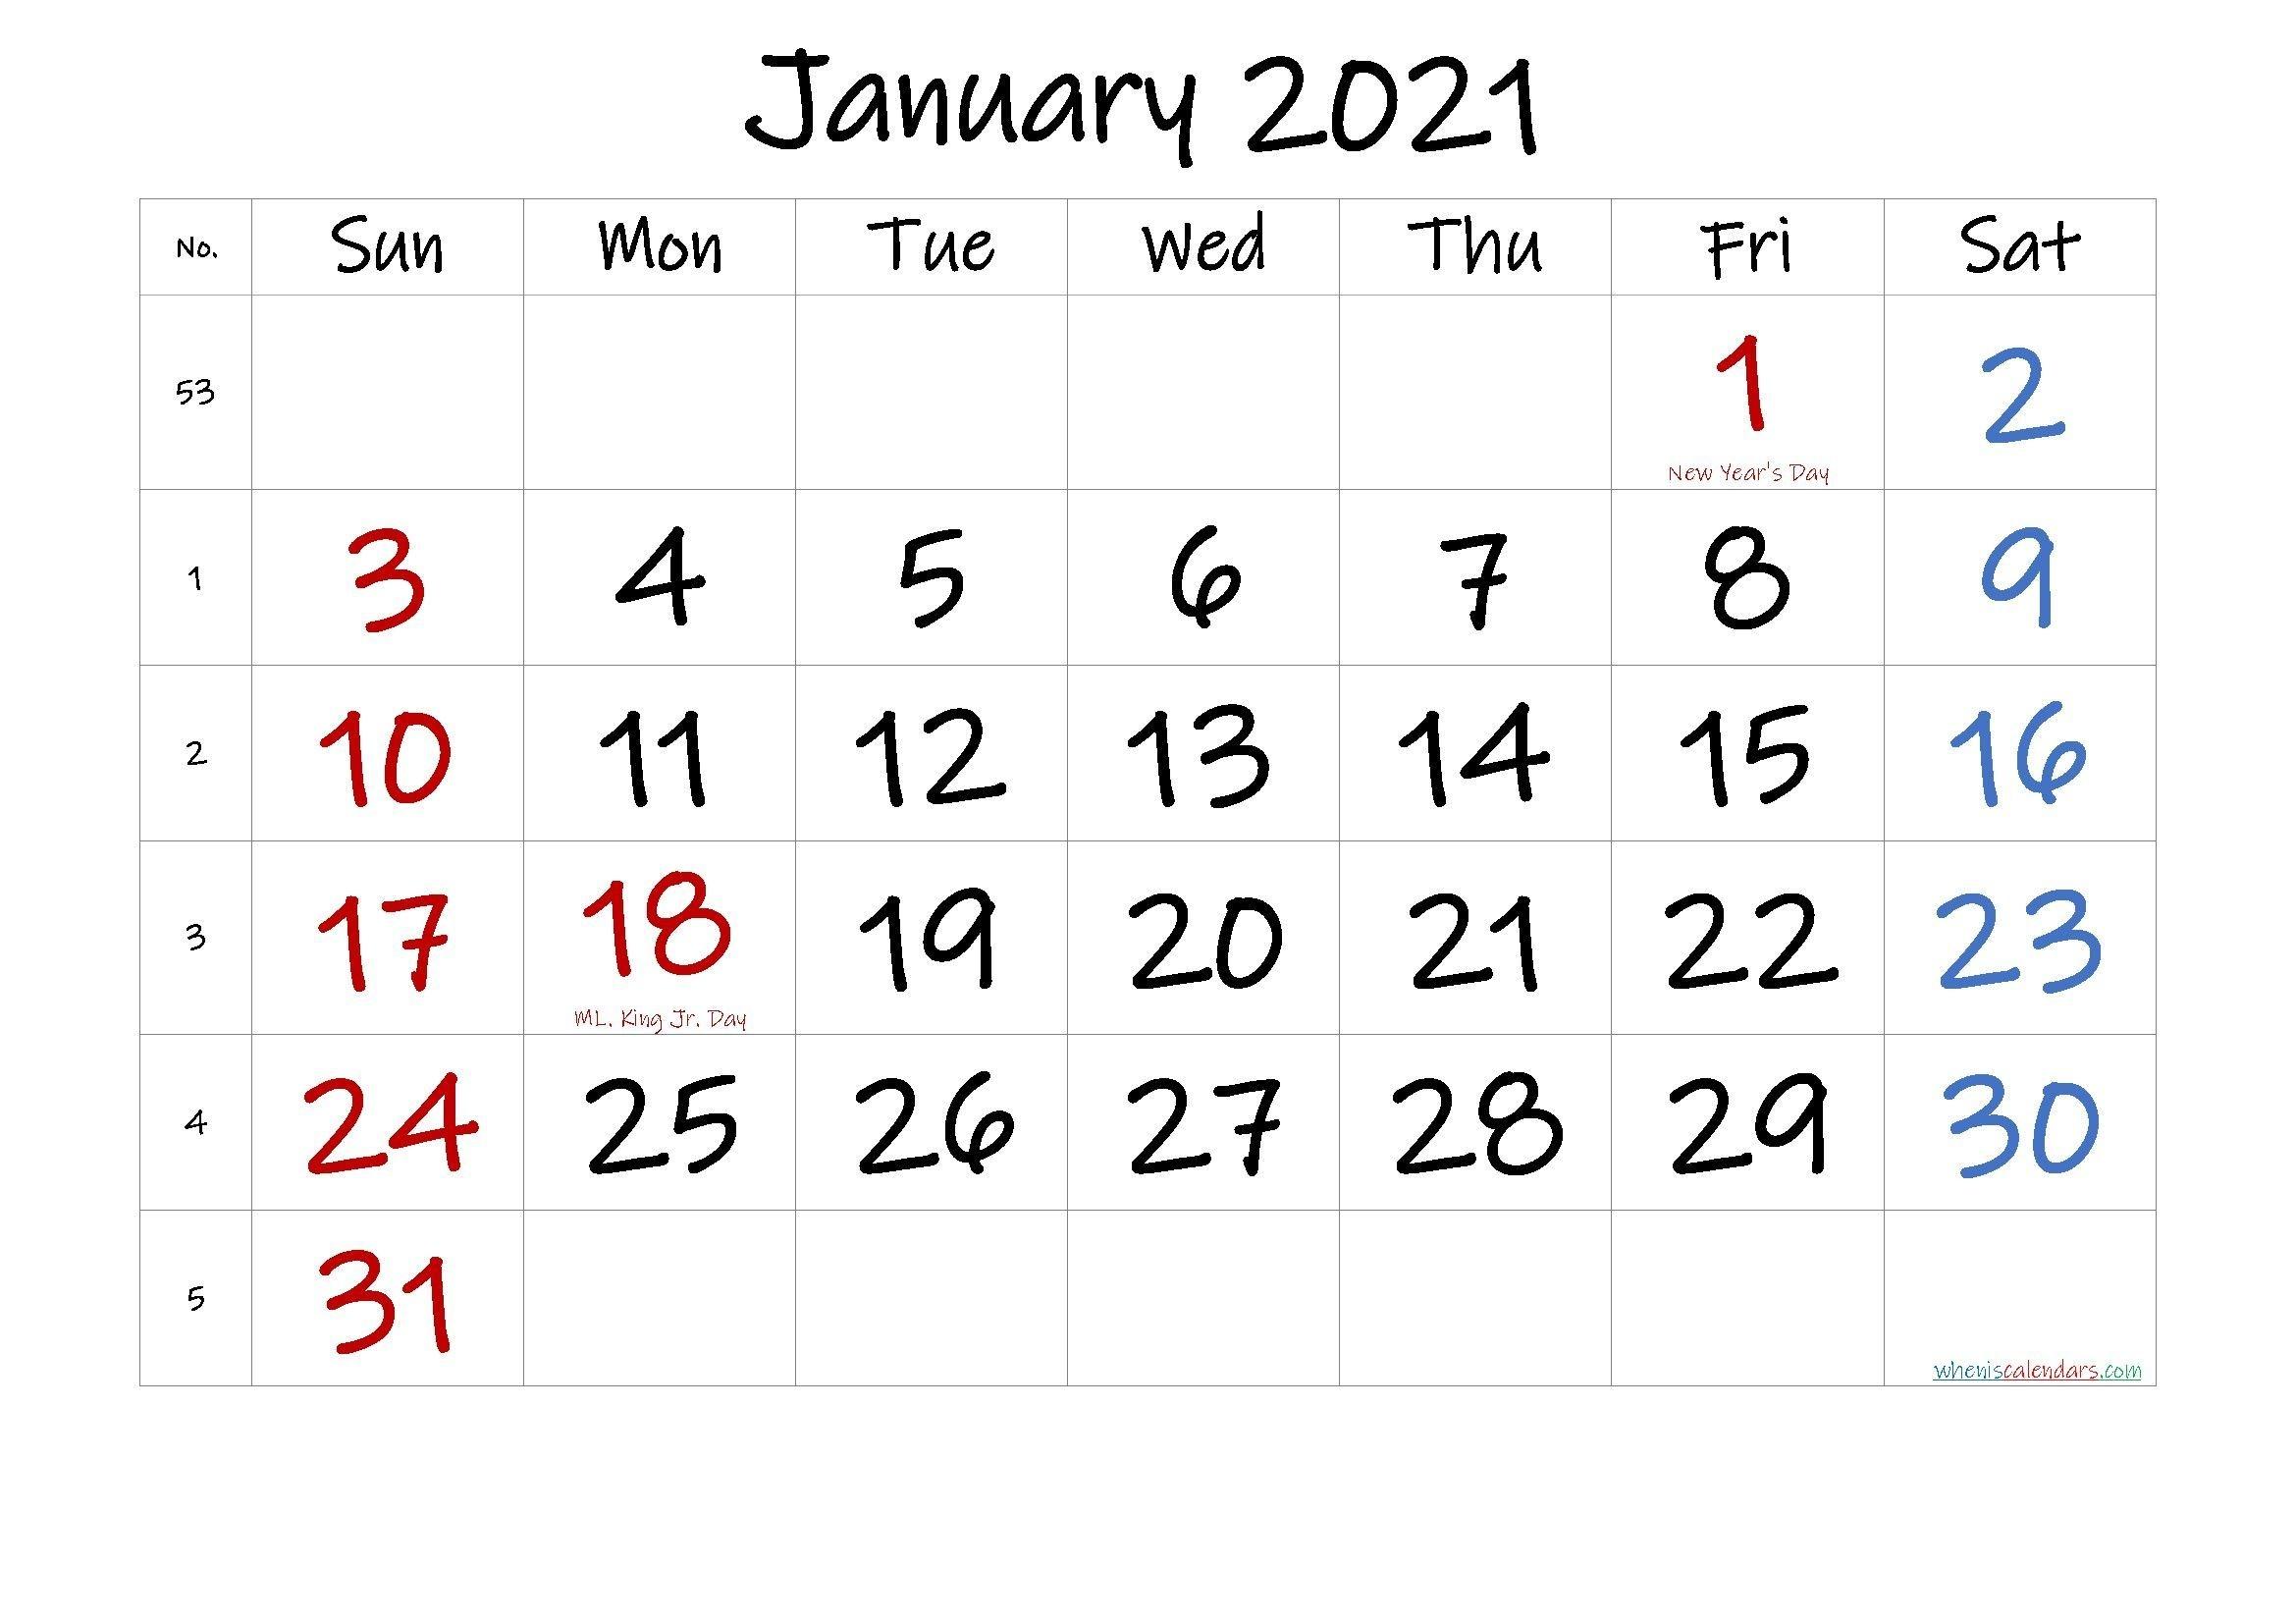 Printable Calendar January 2021 In 2020 | Calendar